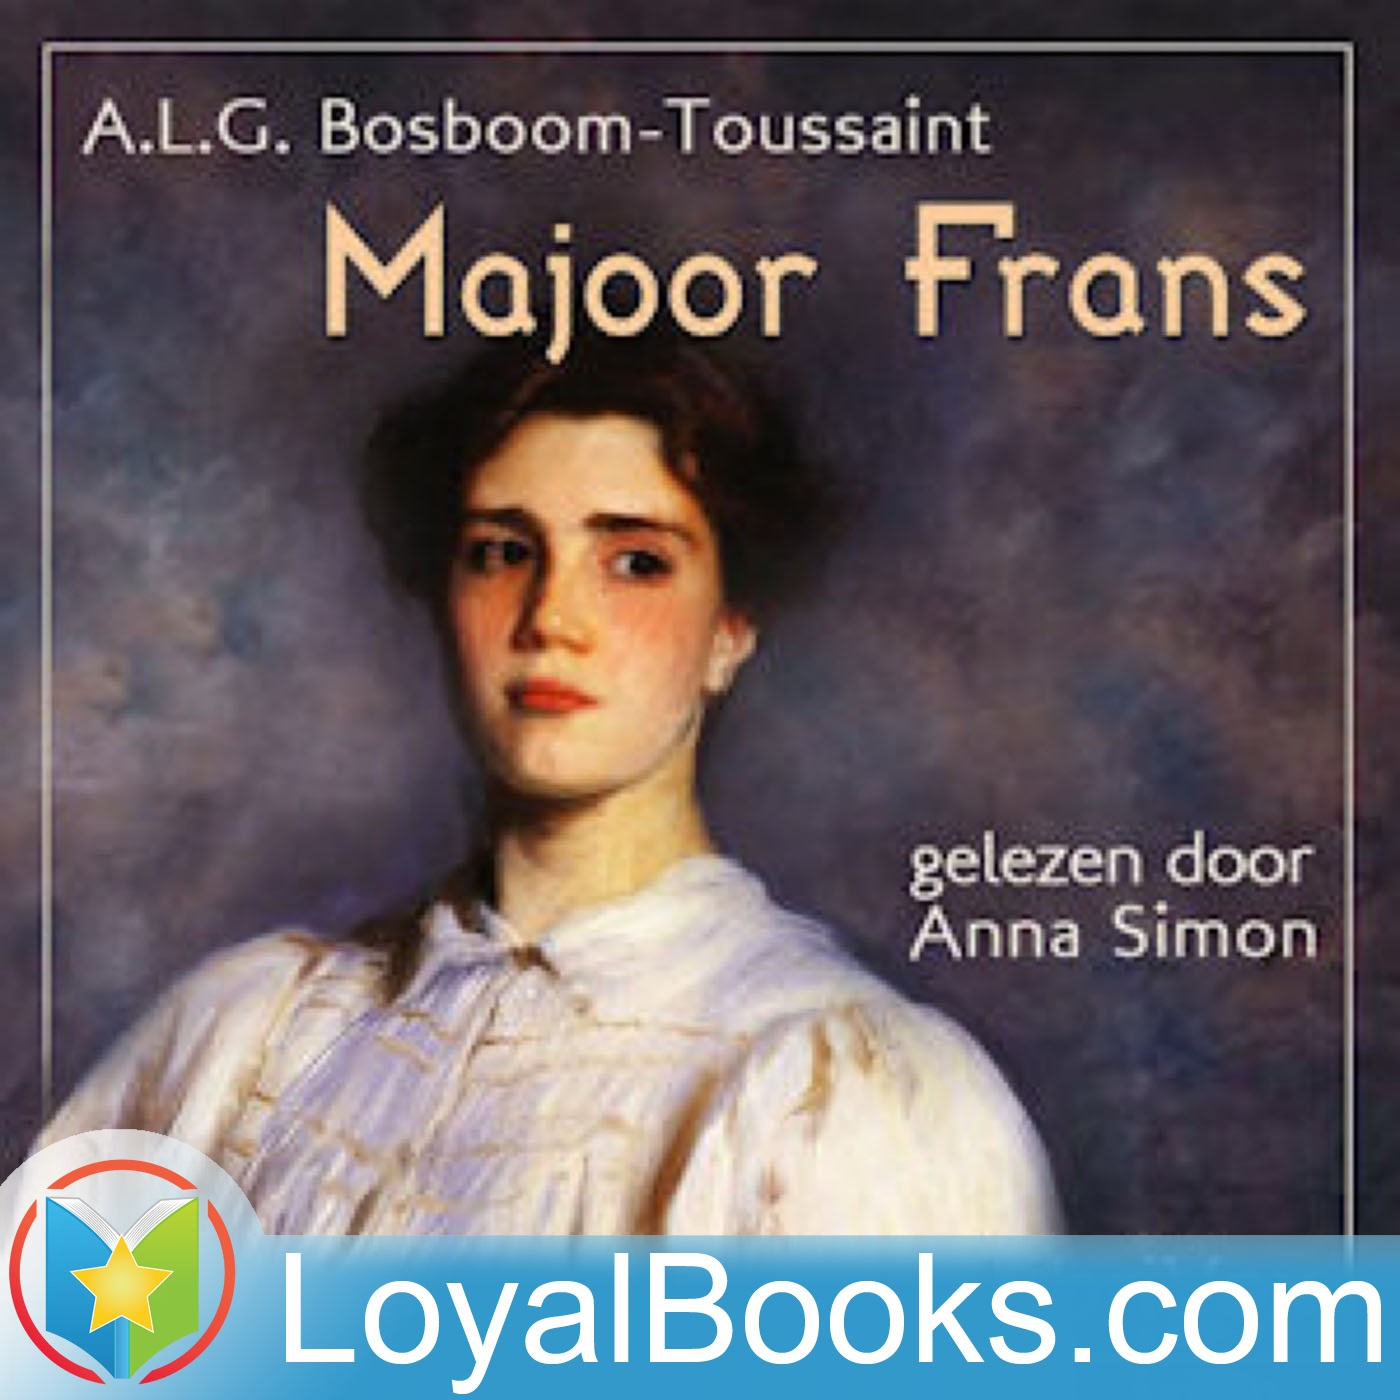 <![CDATA[Majoor Frans by A.L.G. Bosboom-Toussaint]]>